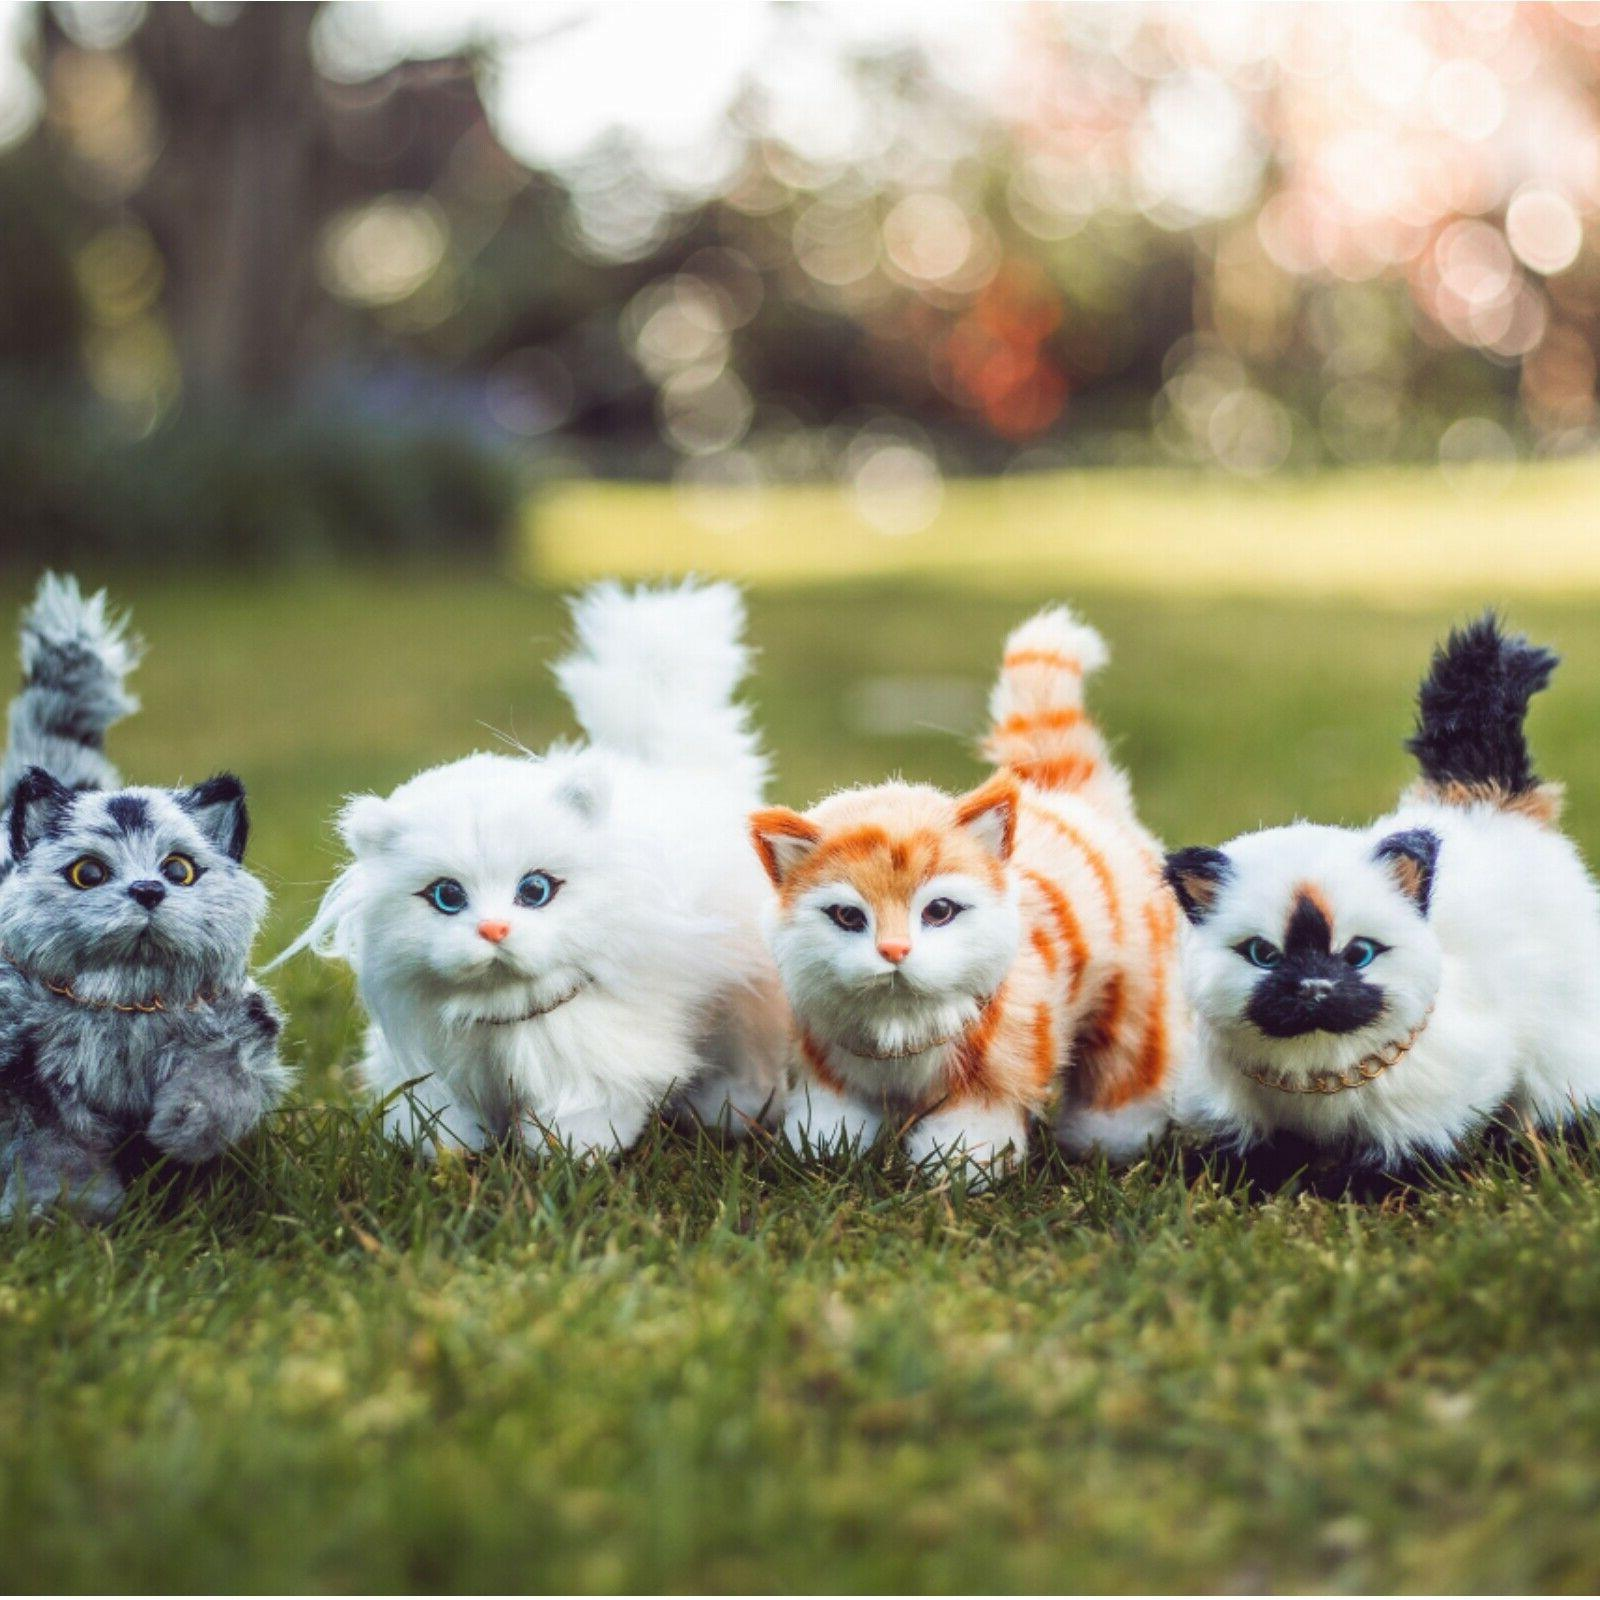 pets 18 inch dolls set of 4